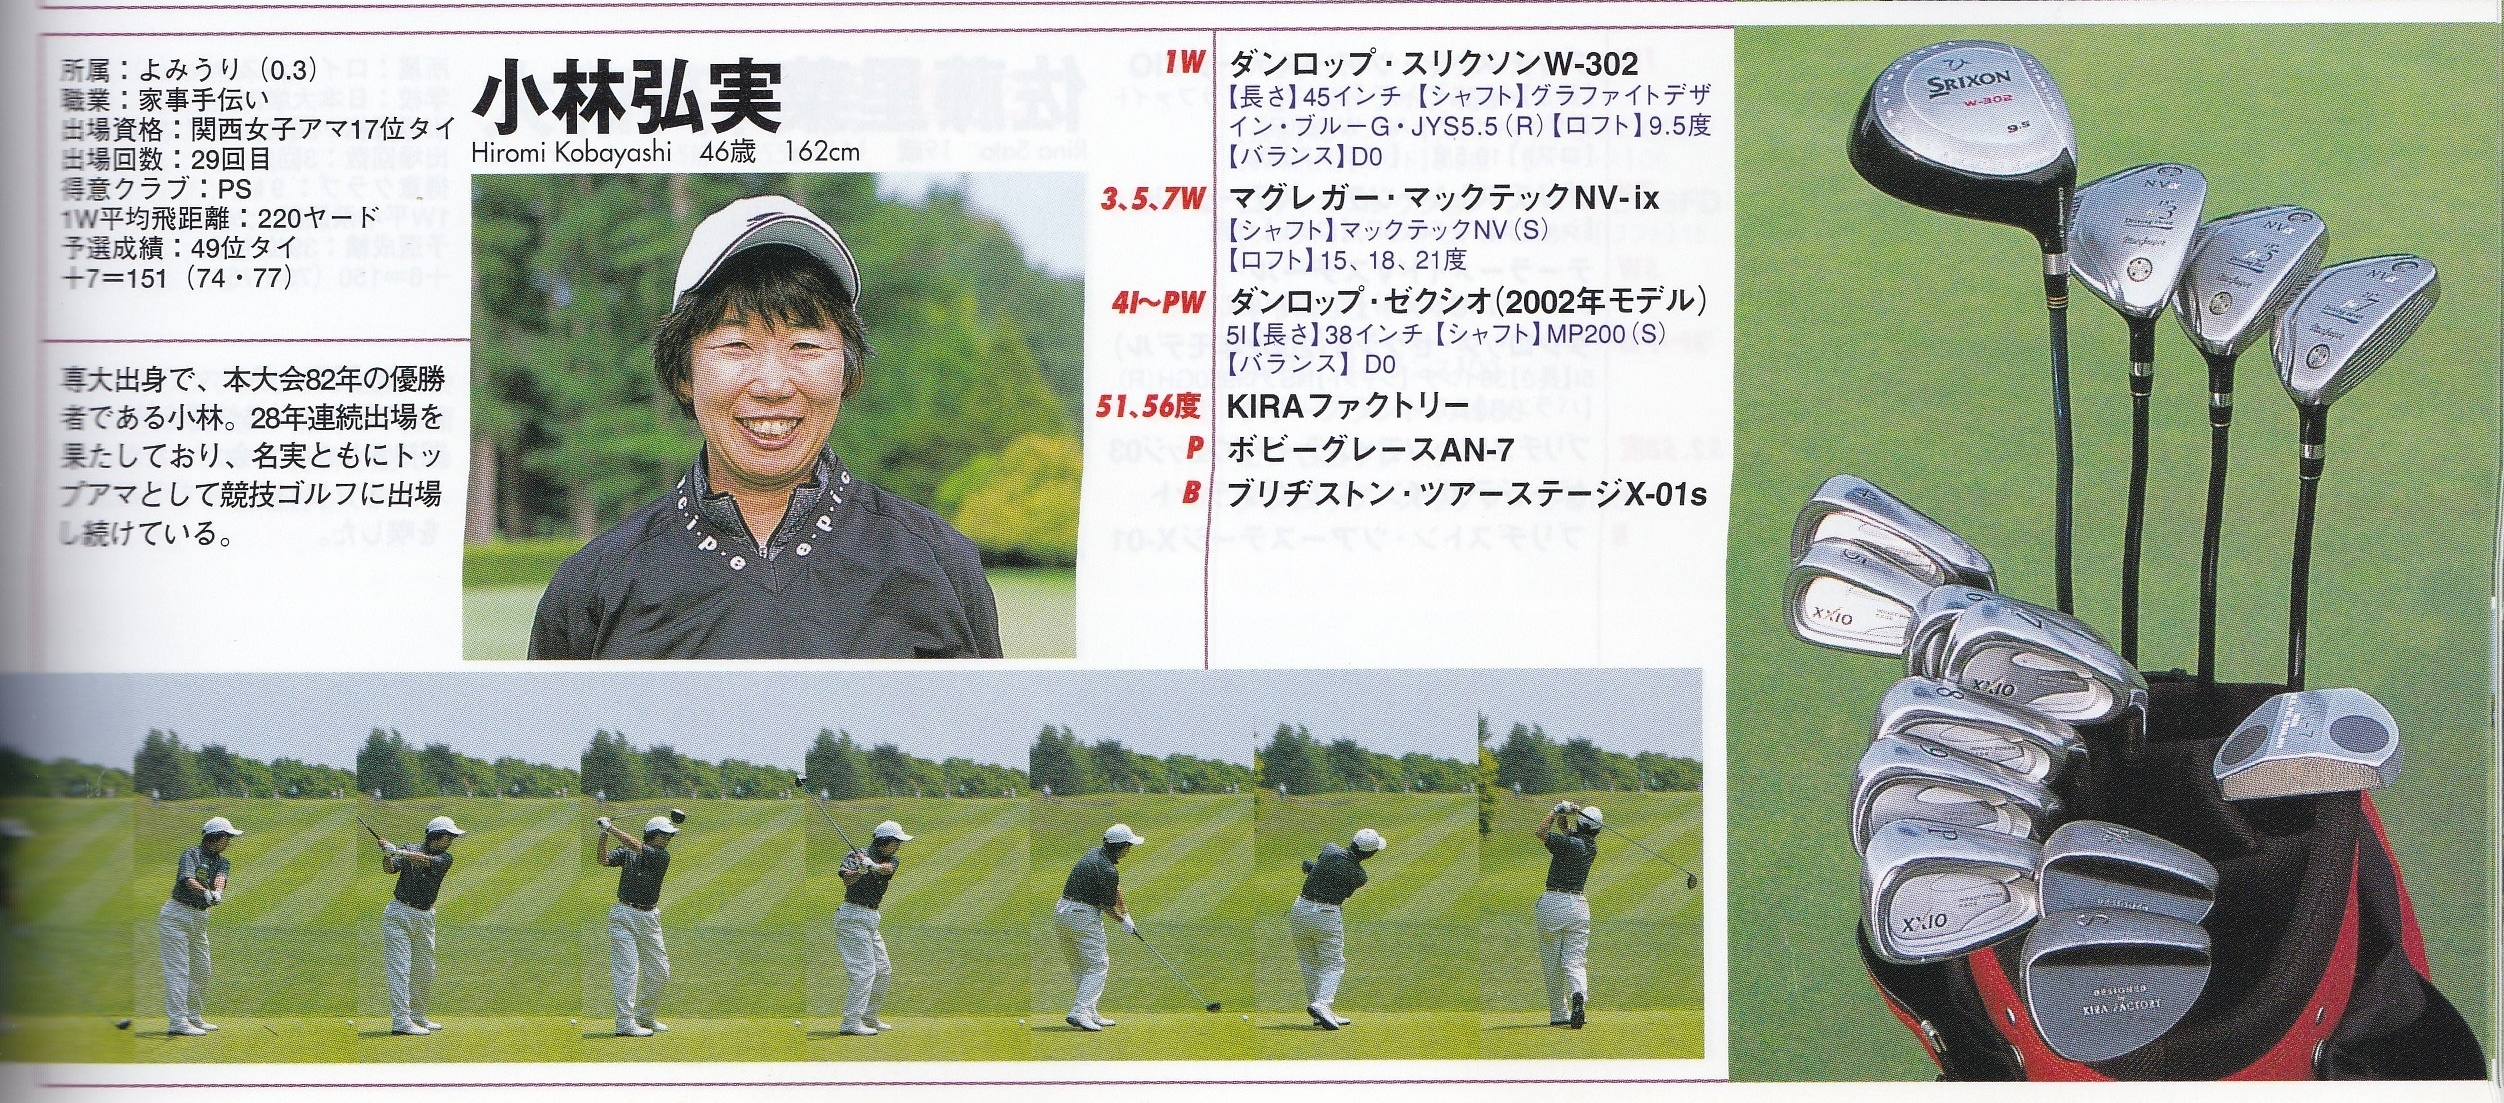 2005.9 Golf Style Japan women's amateur club's setting